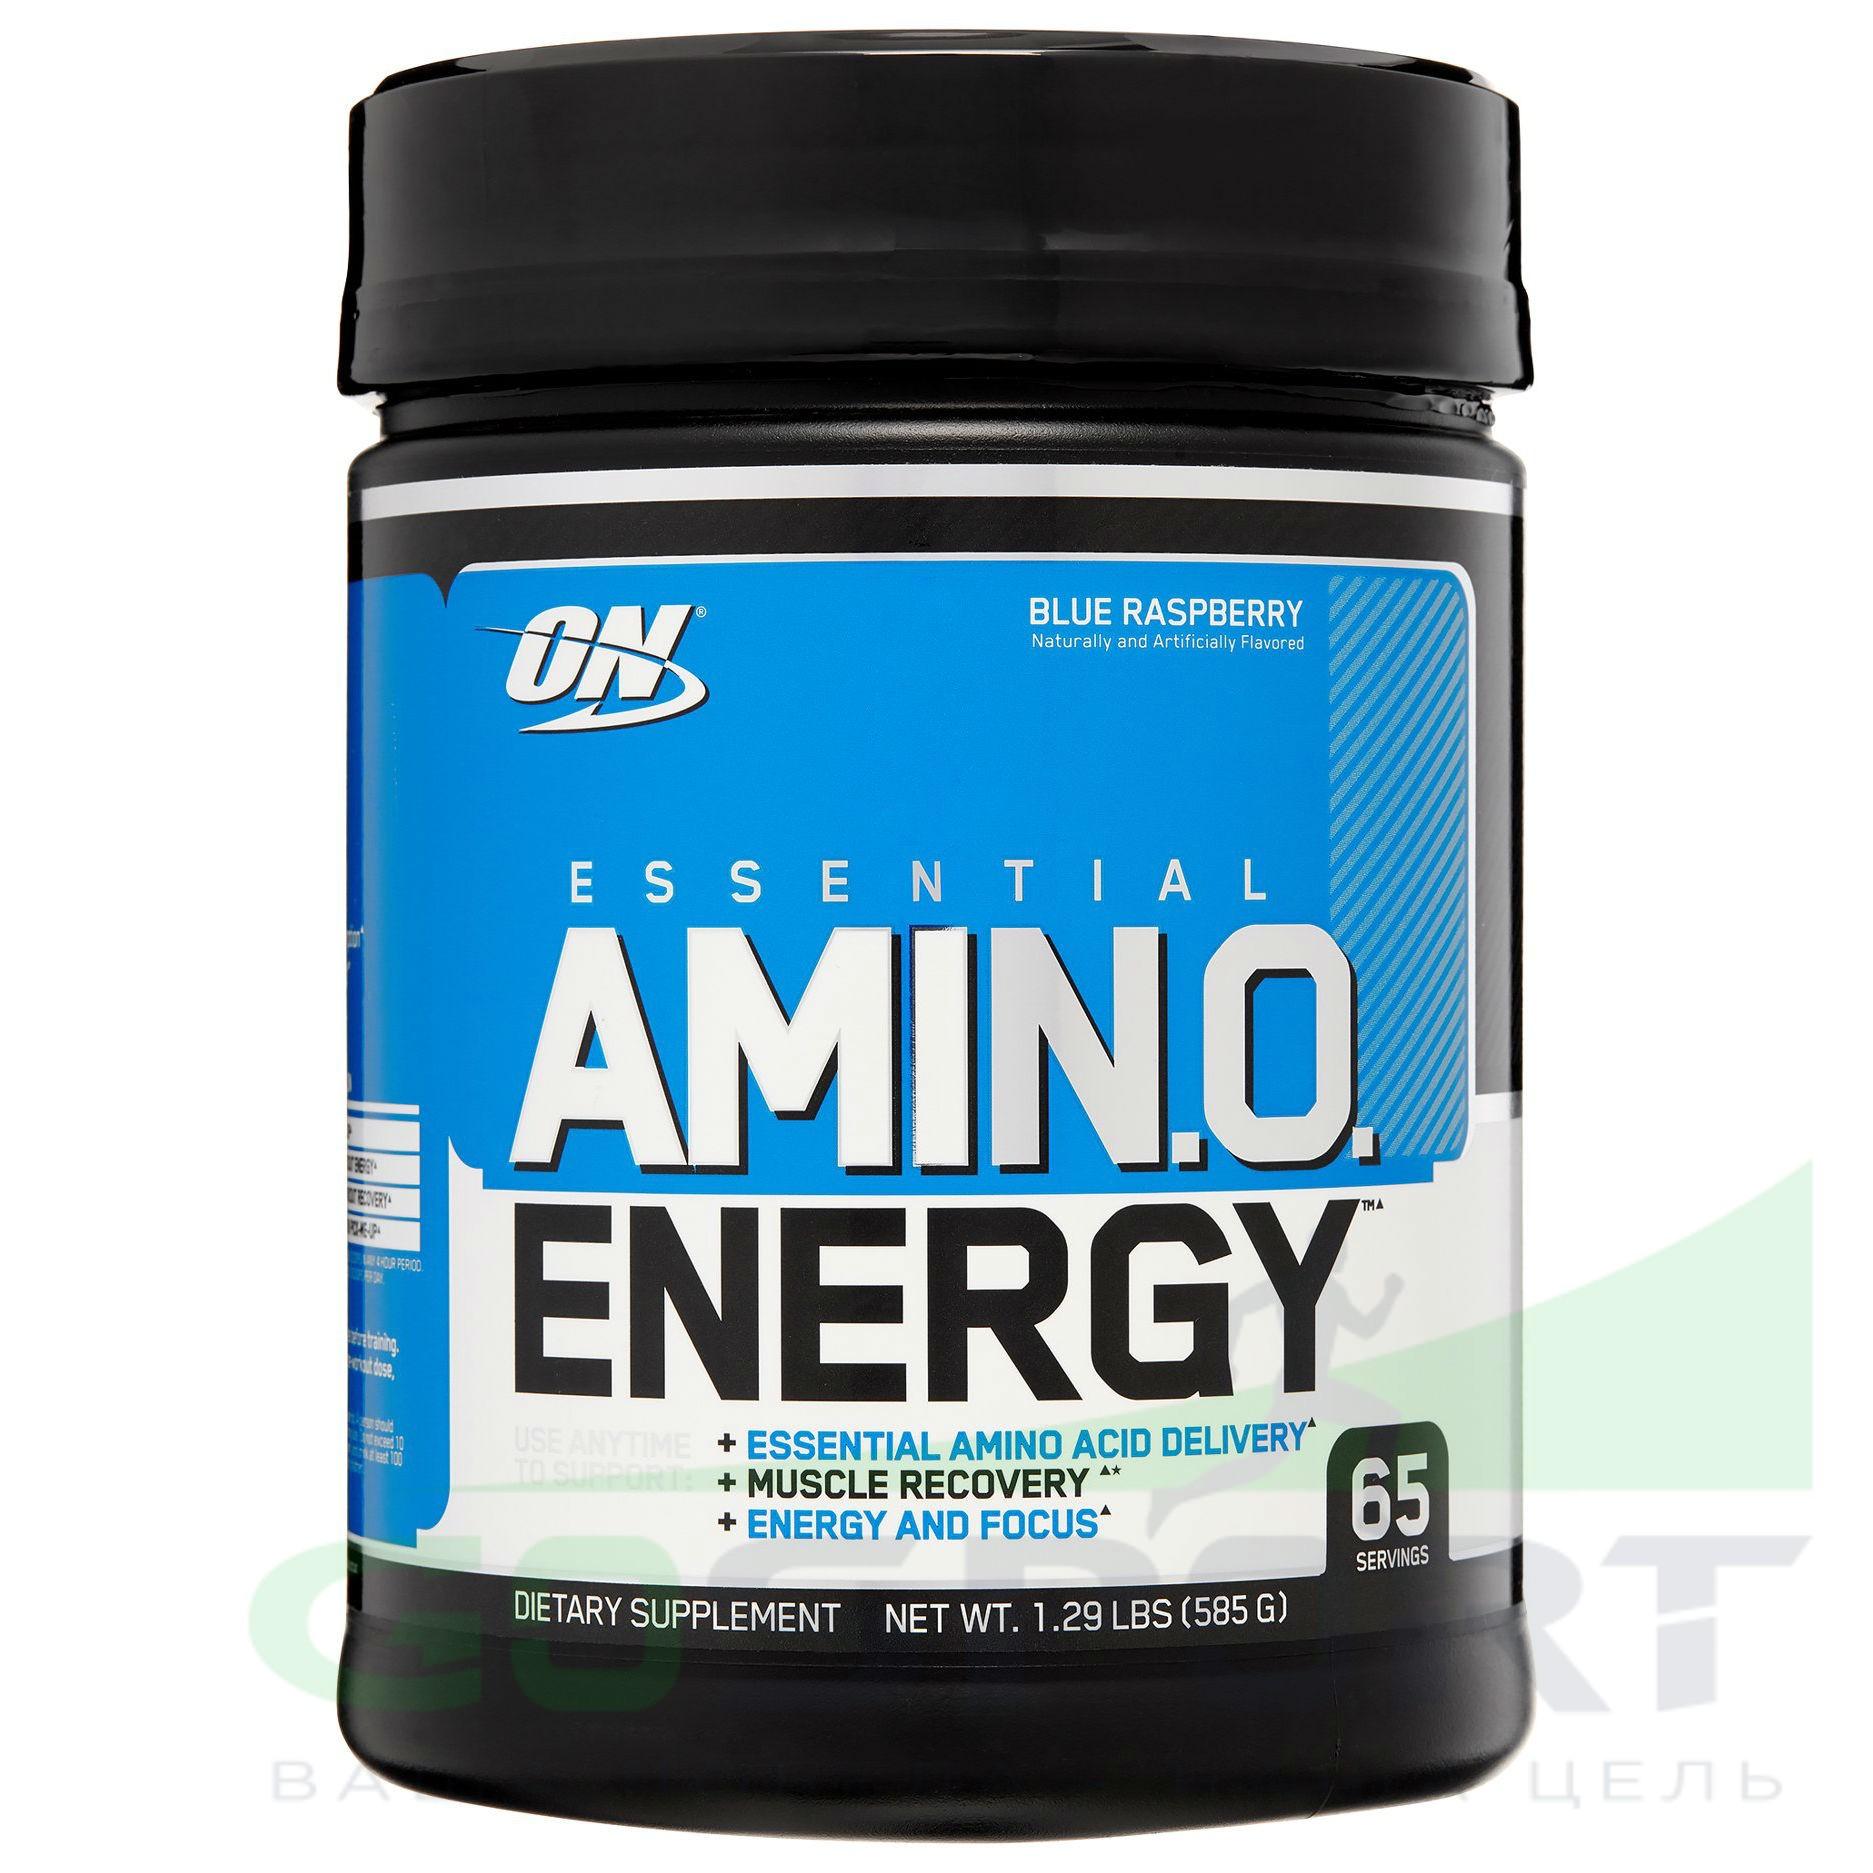 Superior amino 2222 от optimum nutrition - как принимать, состав